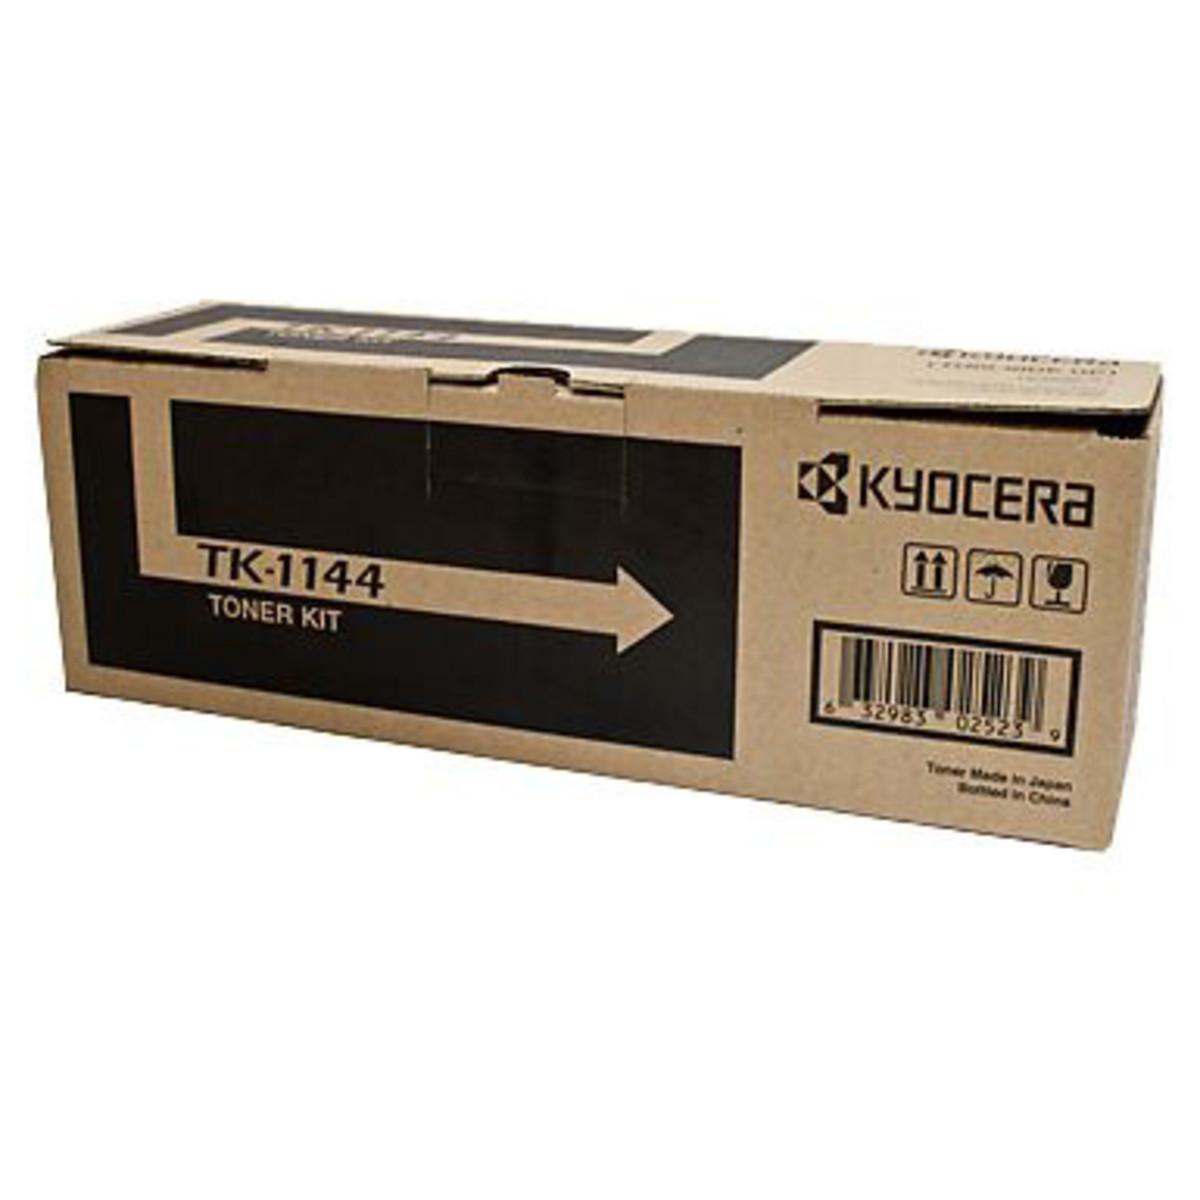 Kyocera TK-1144 Black Toner Cartridge